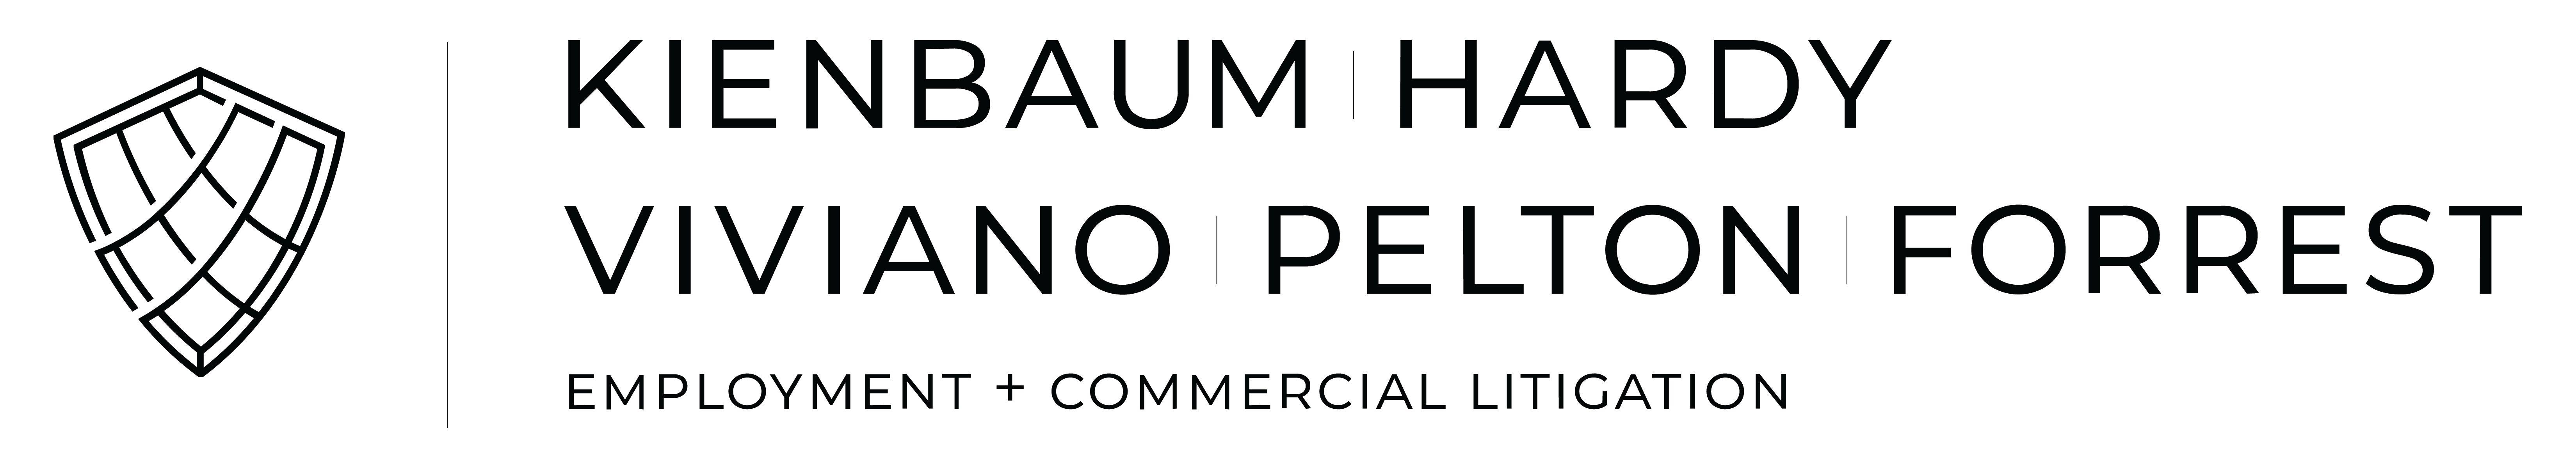 Kienbaum Hardy Viviano Pelton Forrest Logo